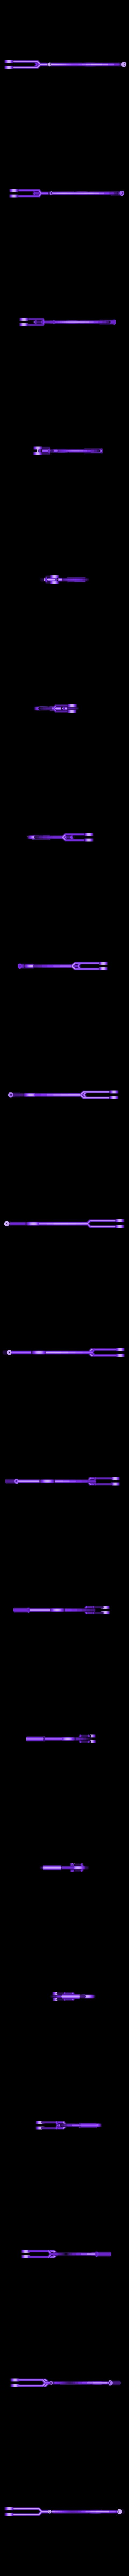 new_frame.stl Download free STL file bicycle lowglider model • 3D printable template, jasperbaudoin